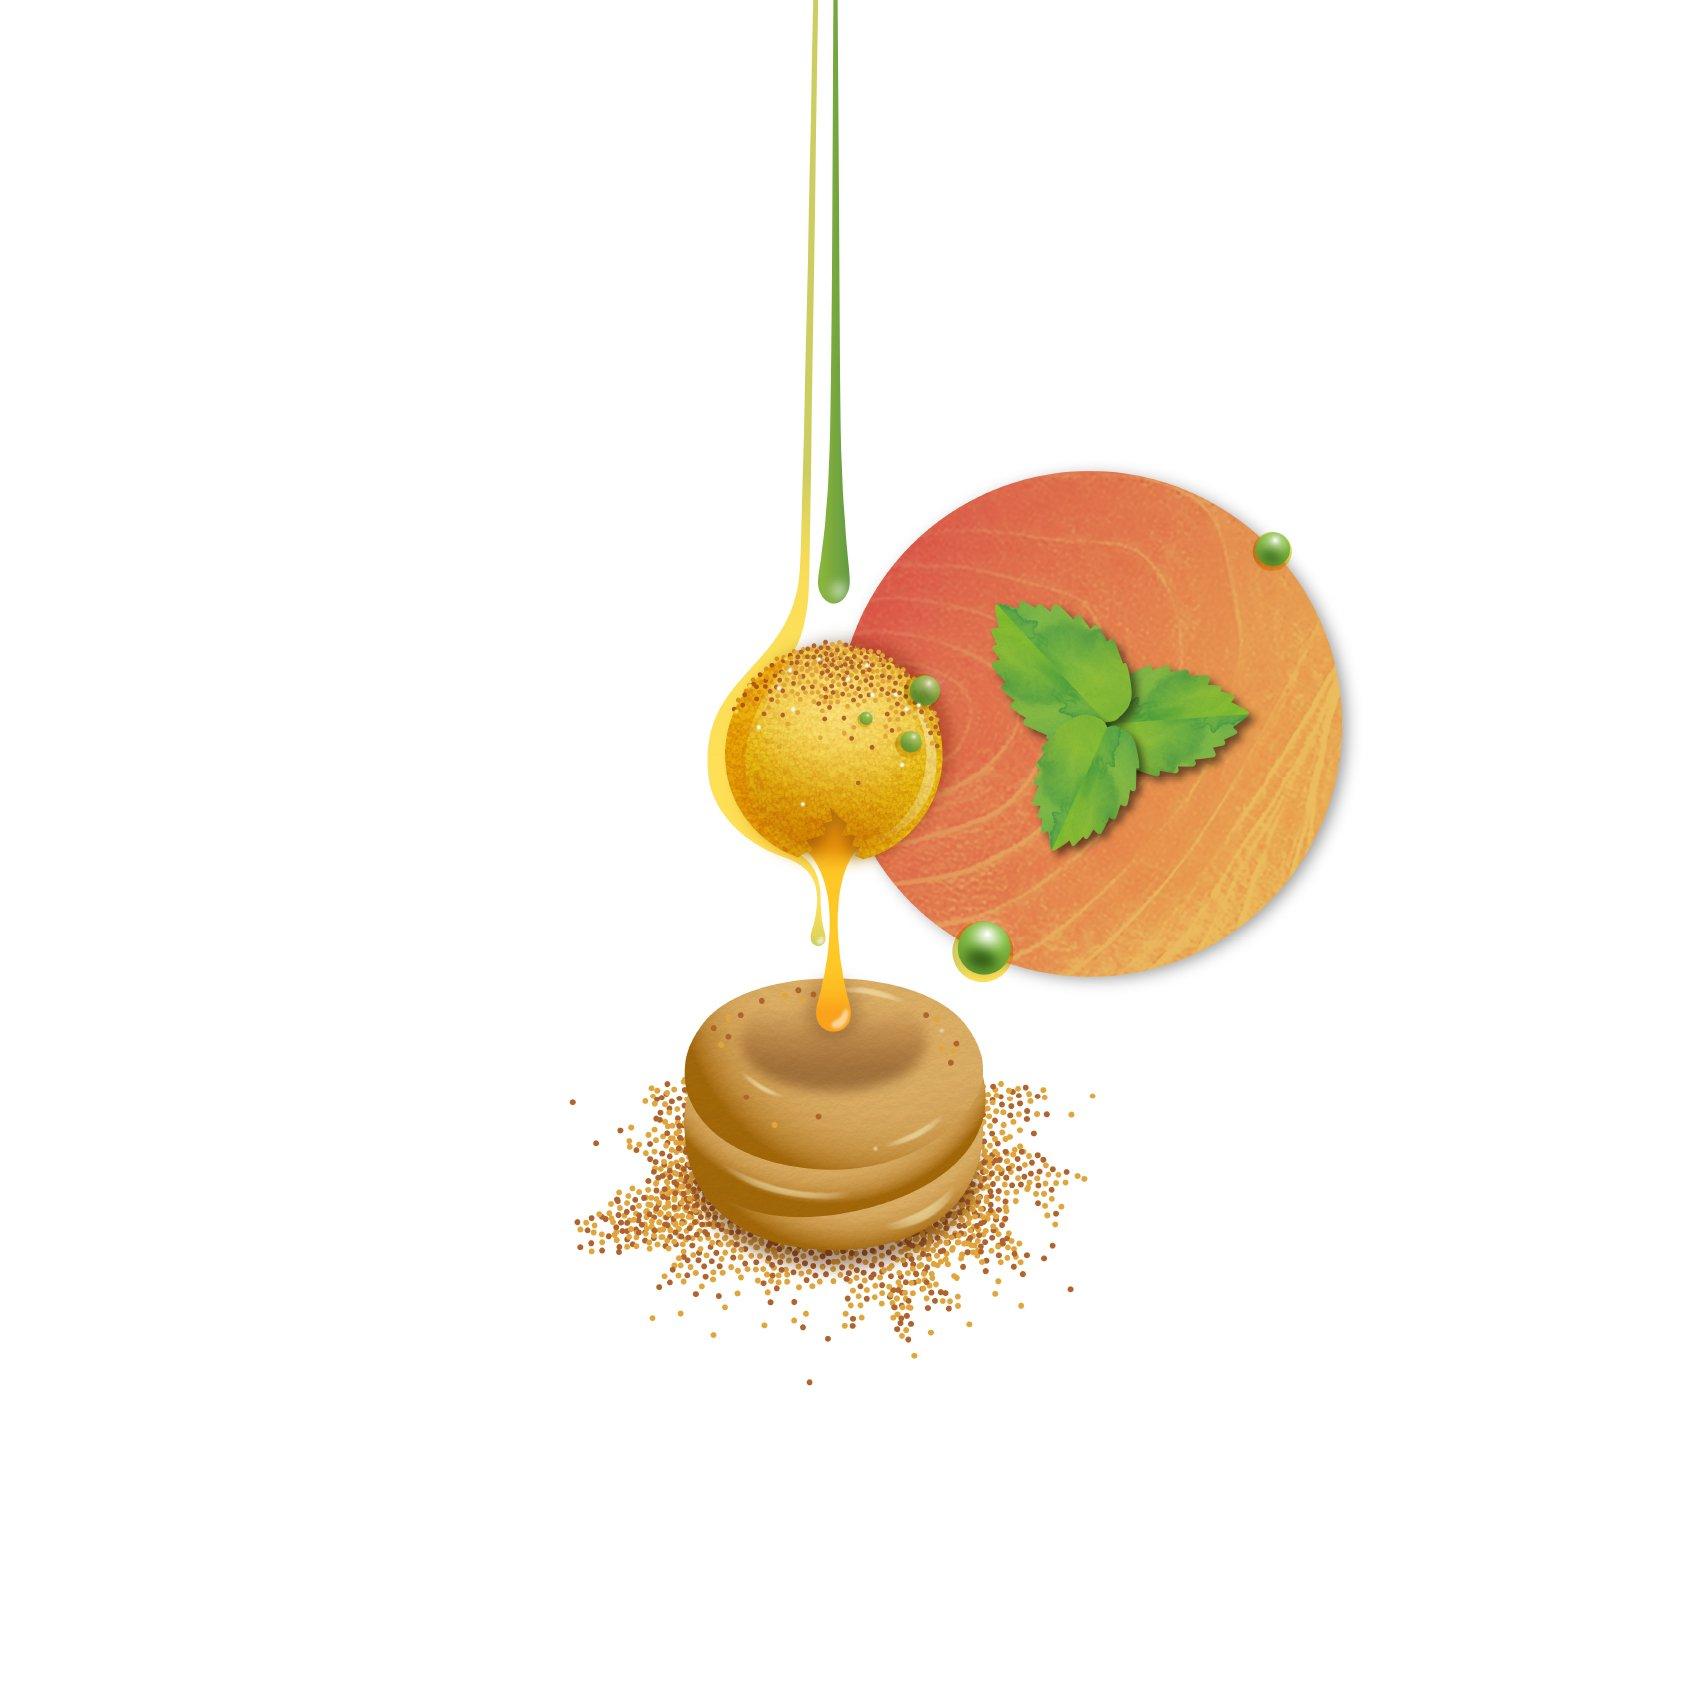 Sublime food design ricette in cibografica 6